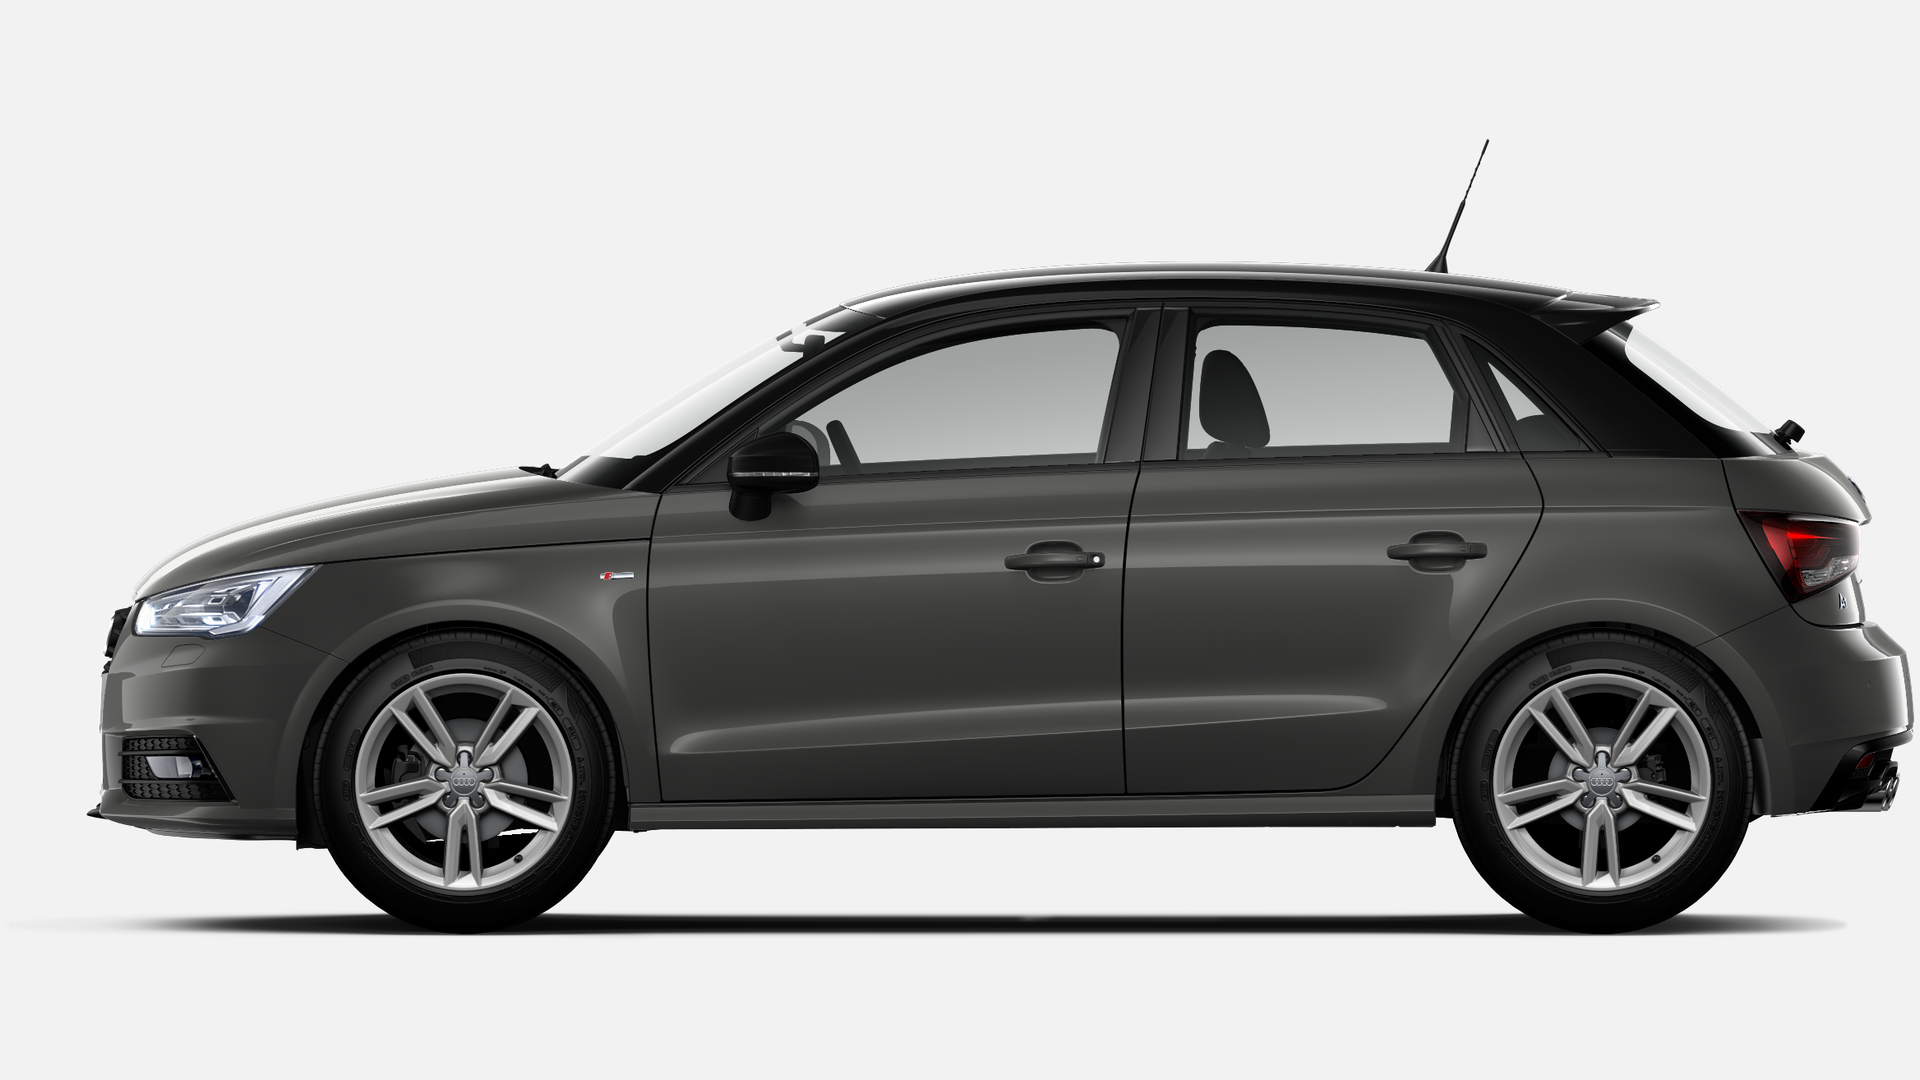 Foto 2 de Audi A1 Sportback 1.4 TFSI Adrenalin 92 kW (125 CV)